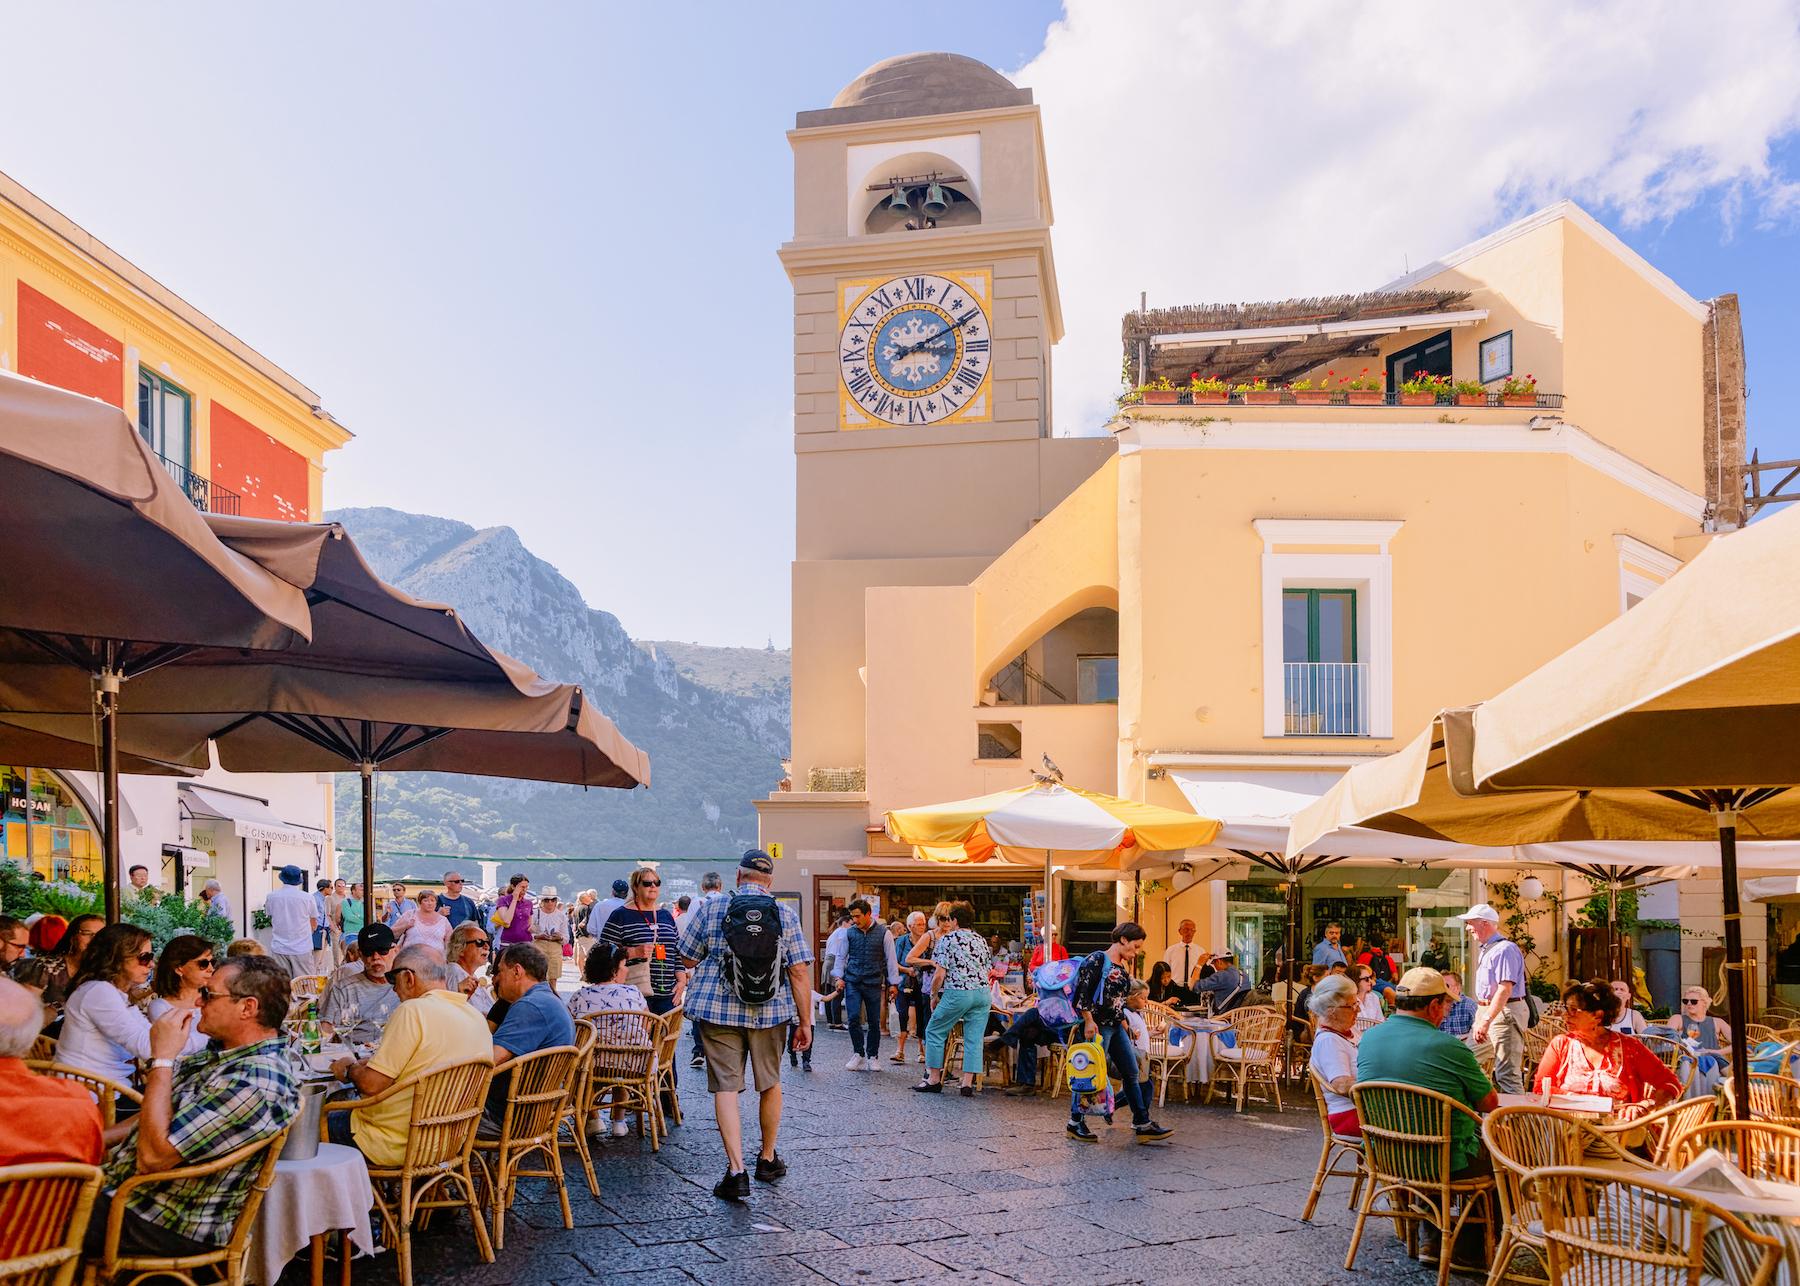 Piazza Umberto in Capri